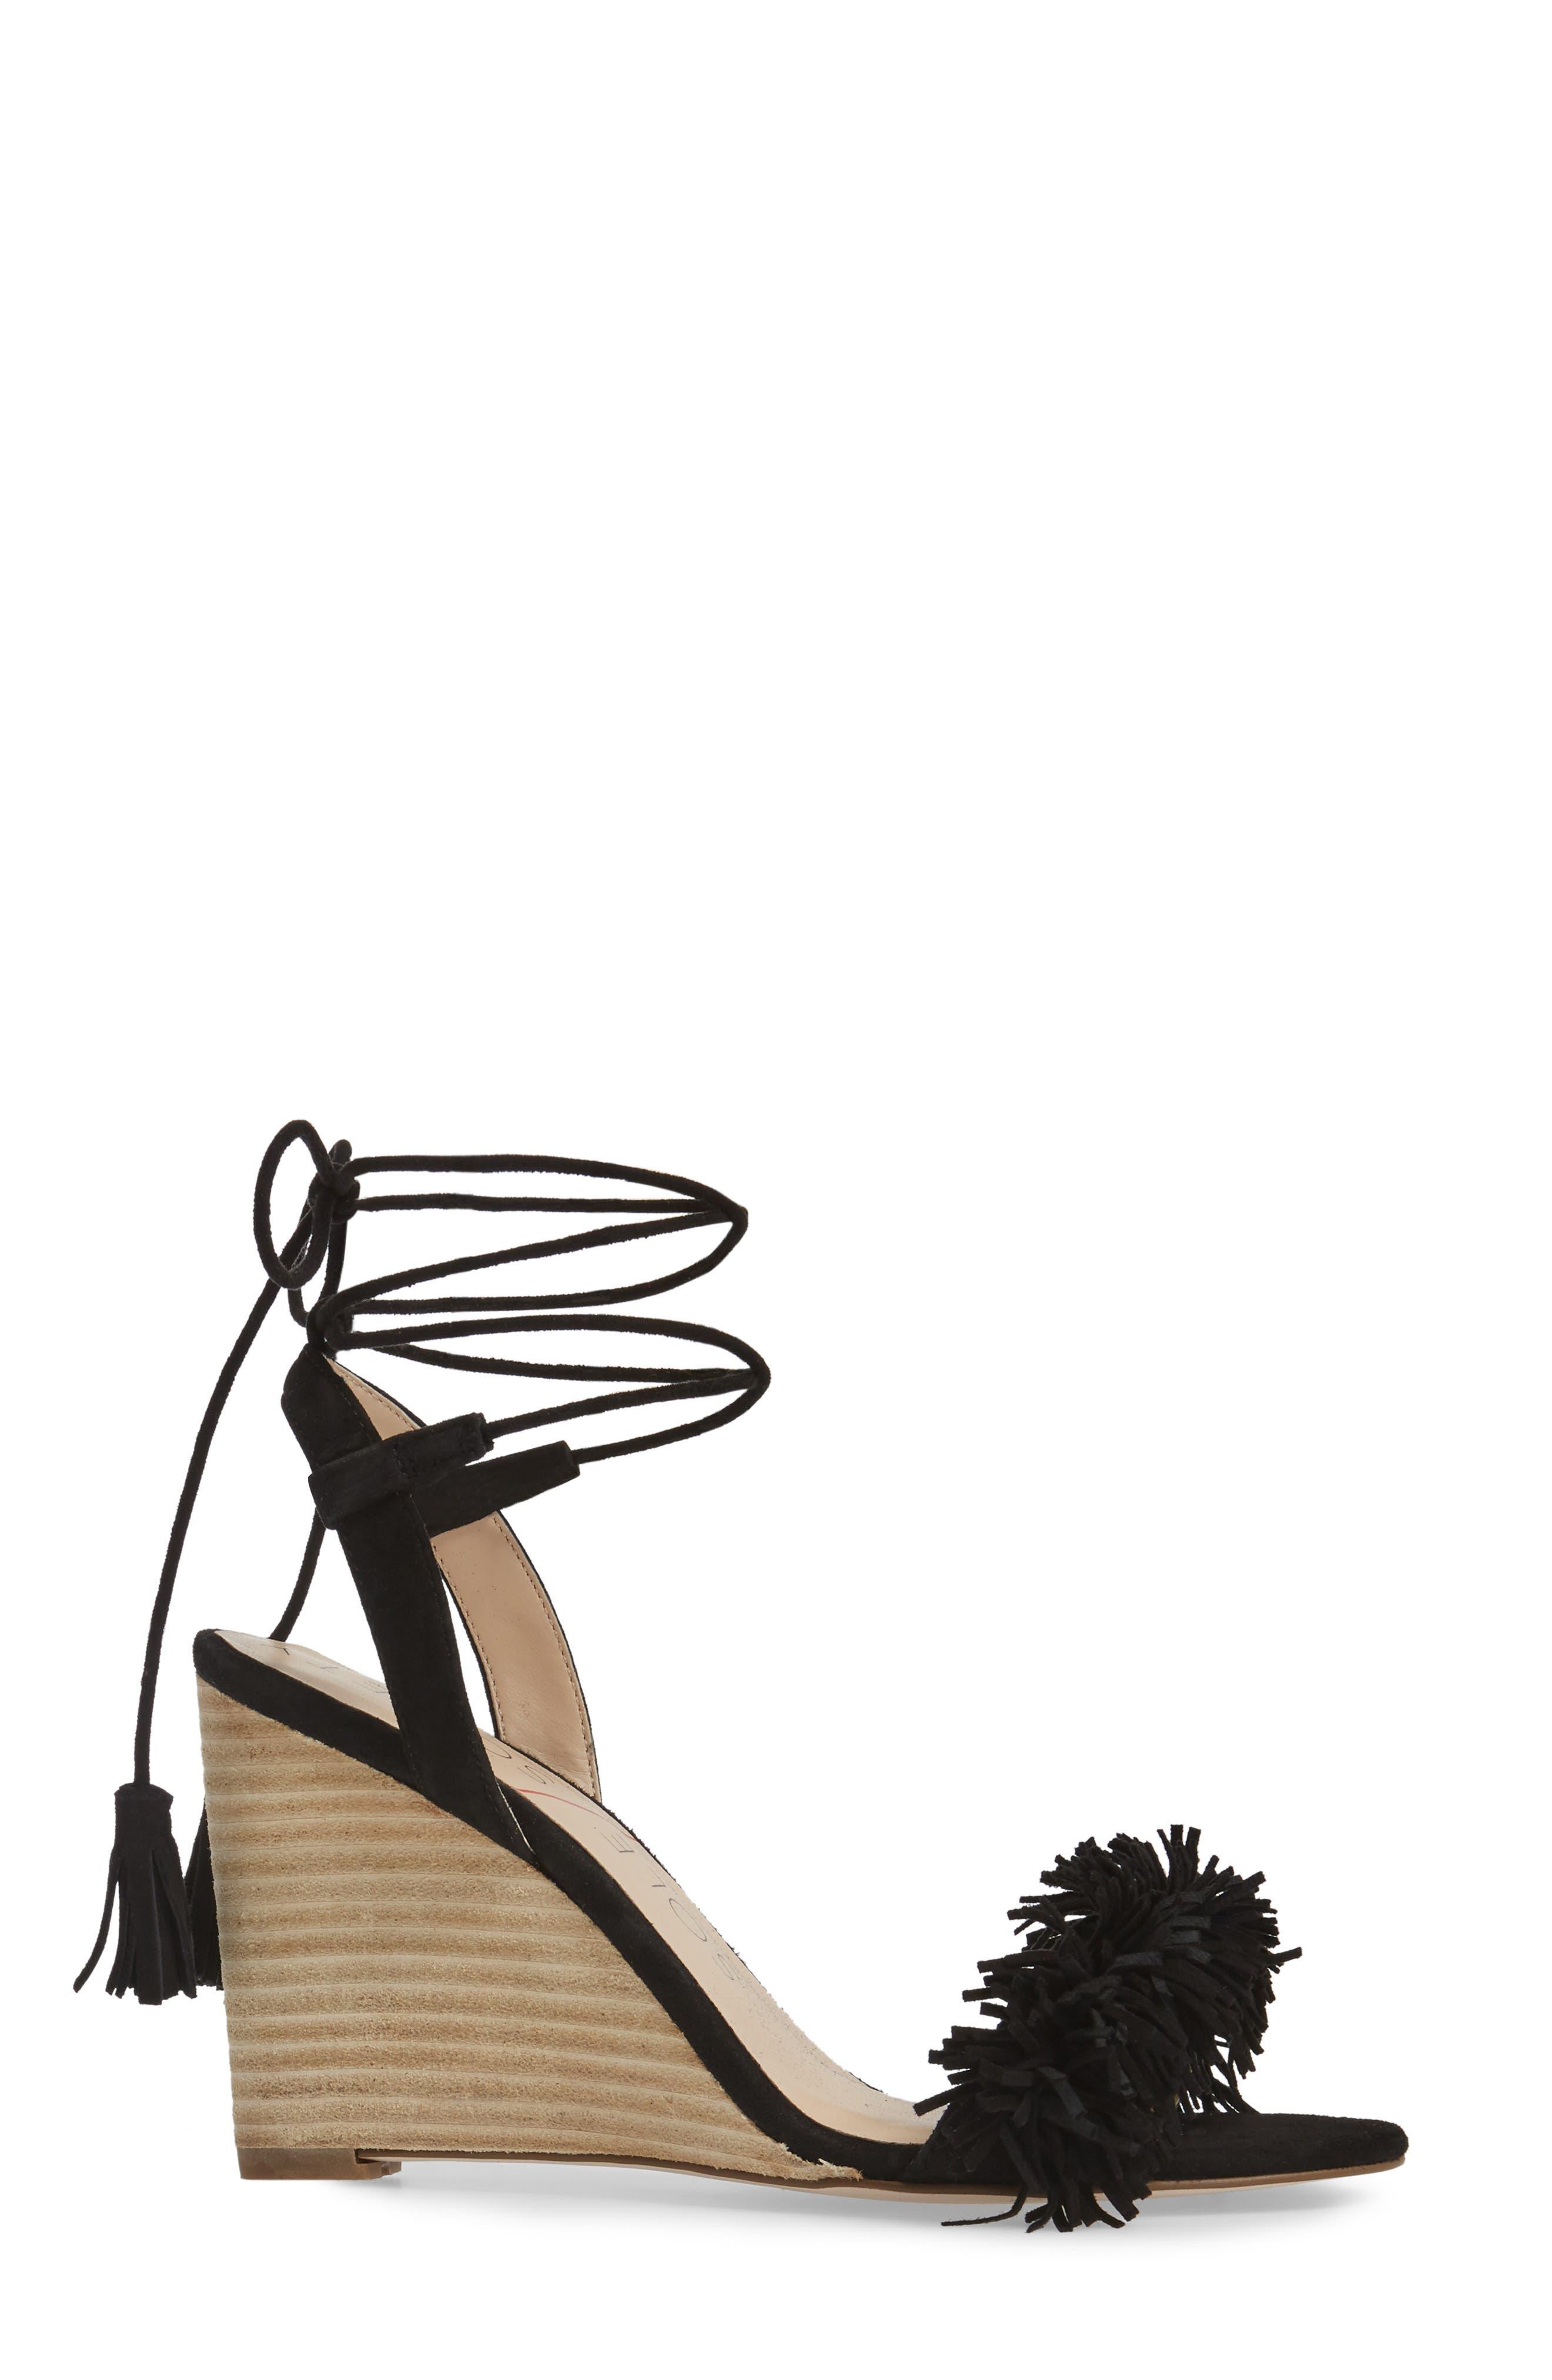 SOLE SOCIETY, Rosea Ankle Wrap Sandal, Alternate thumbnail 3, color, 001